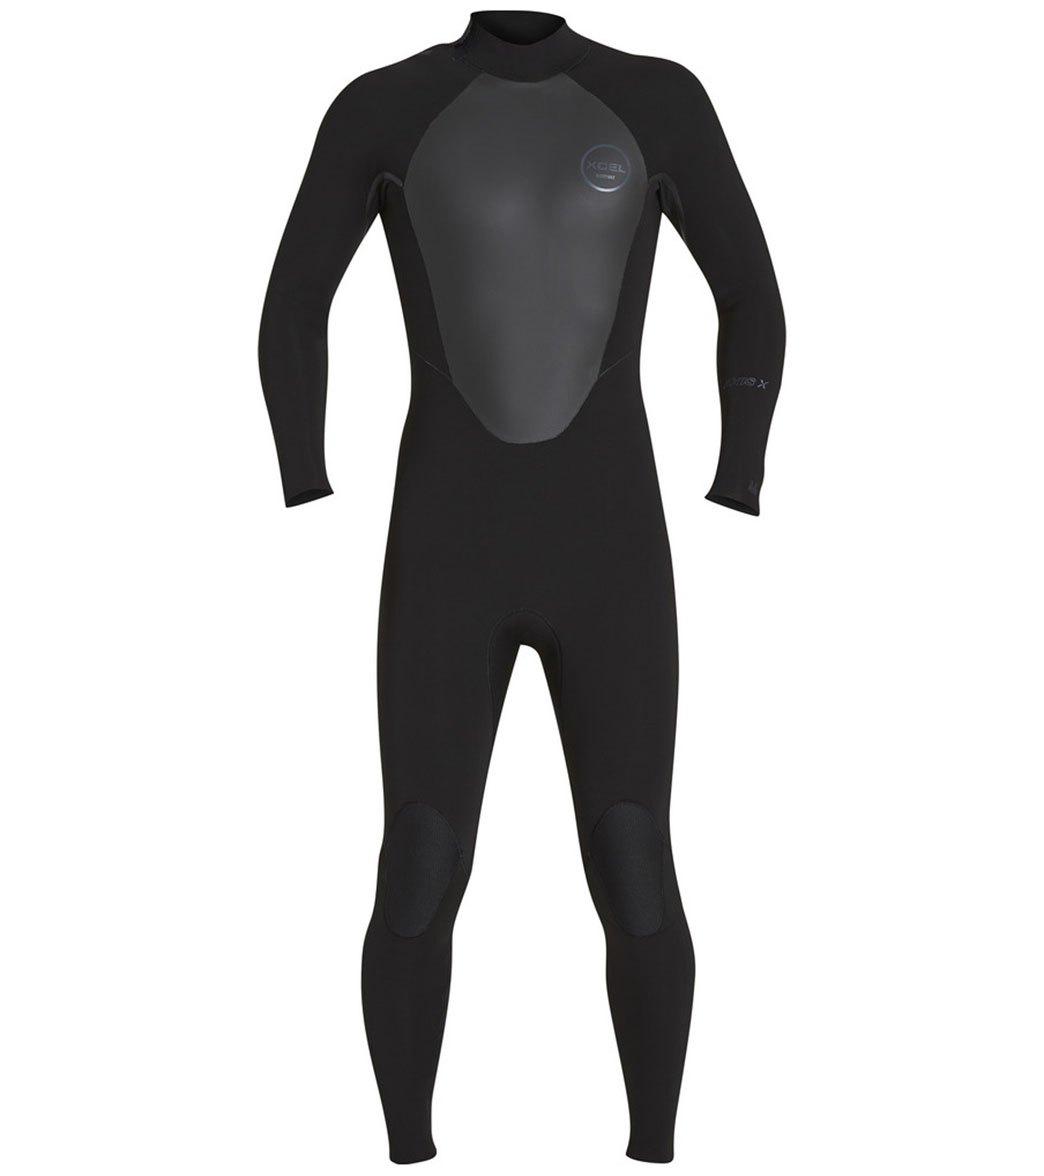 Xcel 3/2mm Axis Back Zip Coldwater Fullsuit Wetsuit